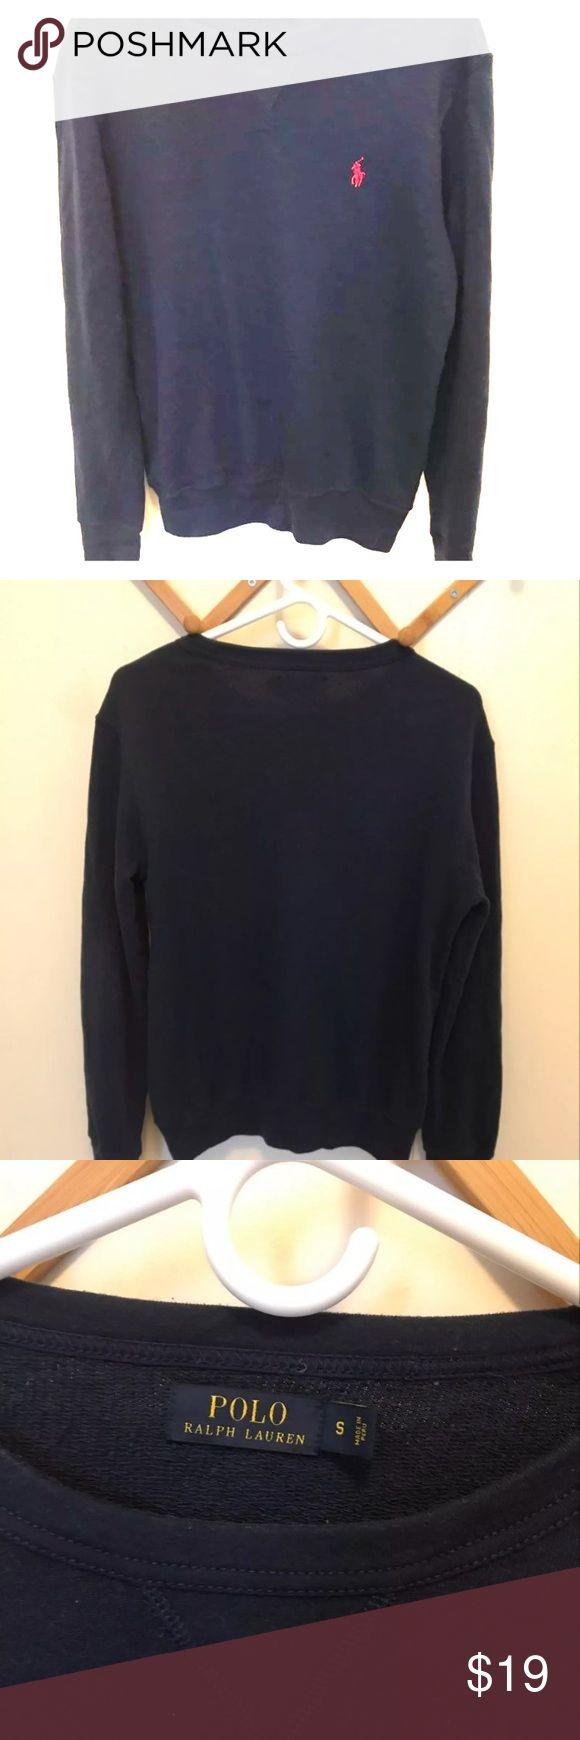 Polo Ralph Lauren Sweatshirt Navy blue terry sweatshirt. Polo by Ralph Lauren Sweaters Crew & Scoop Necks